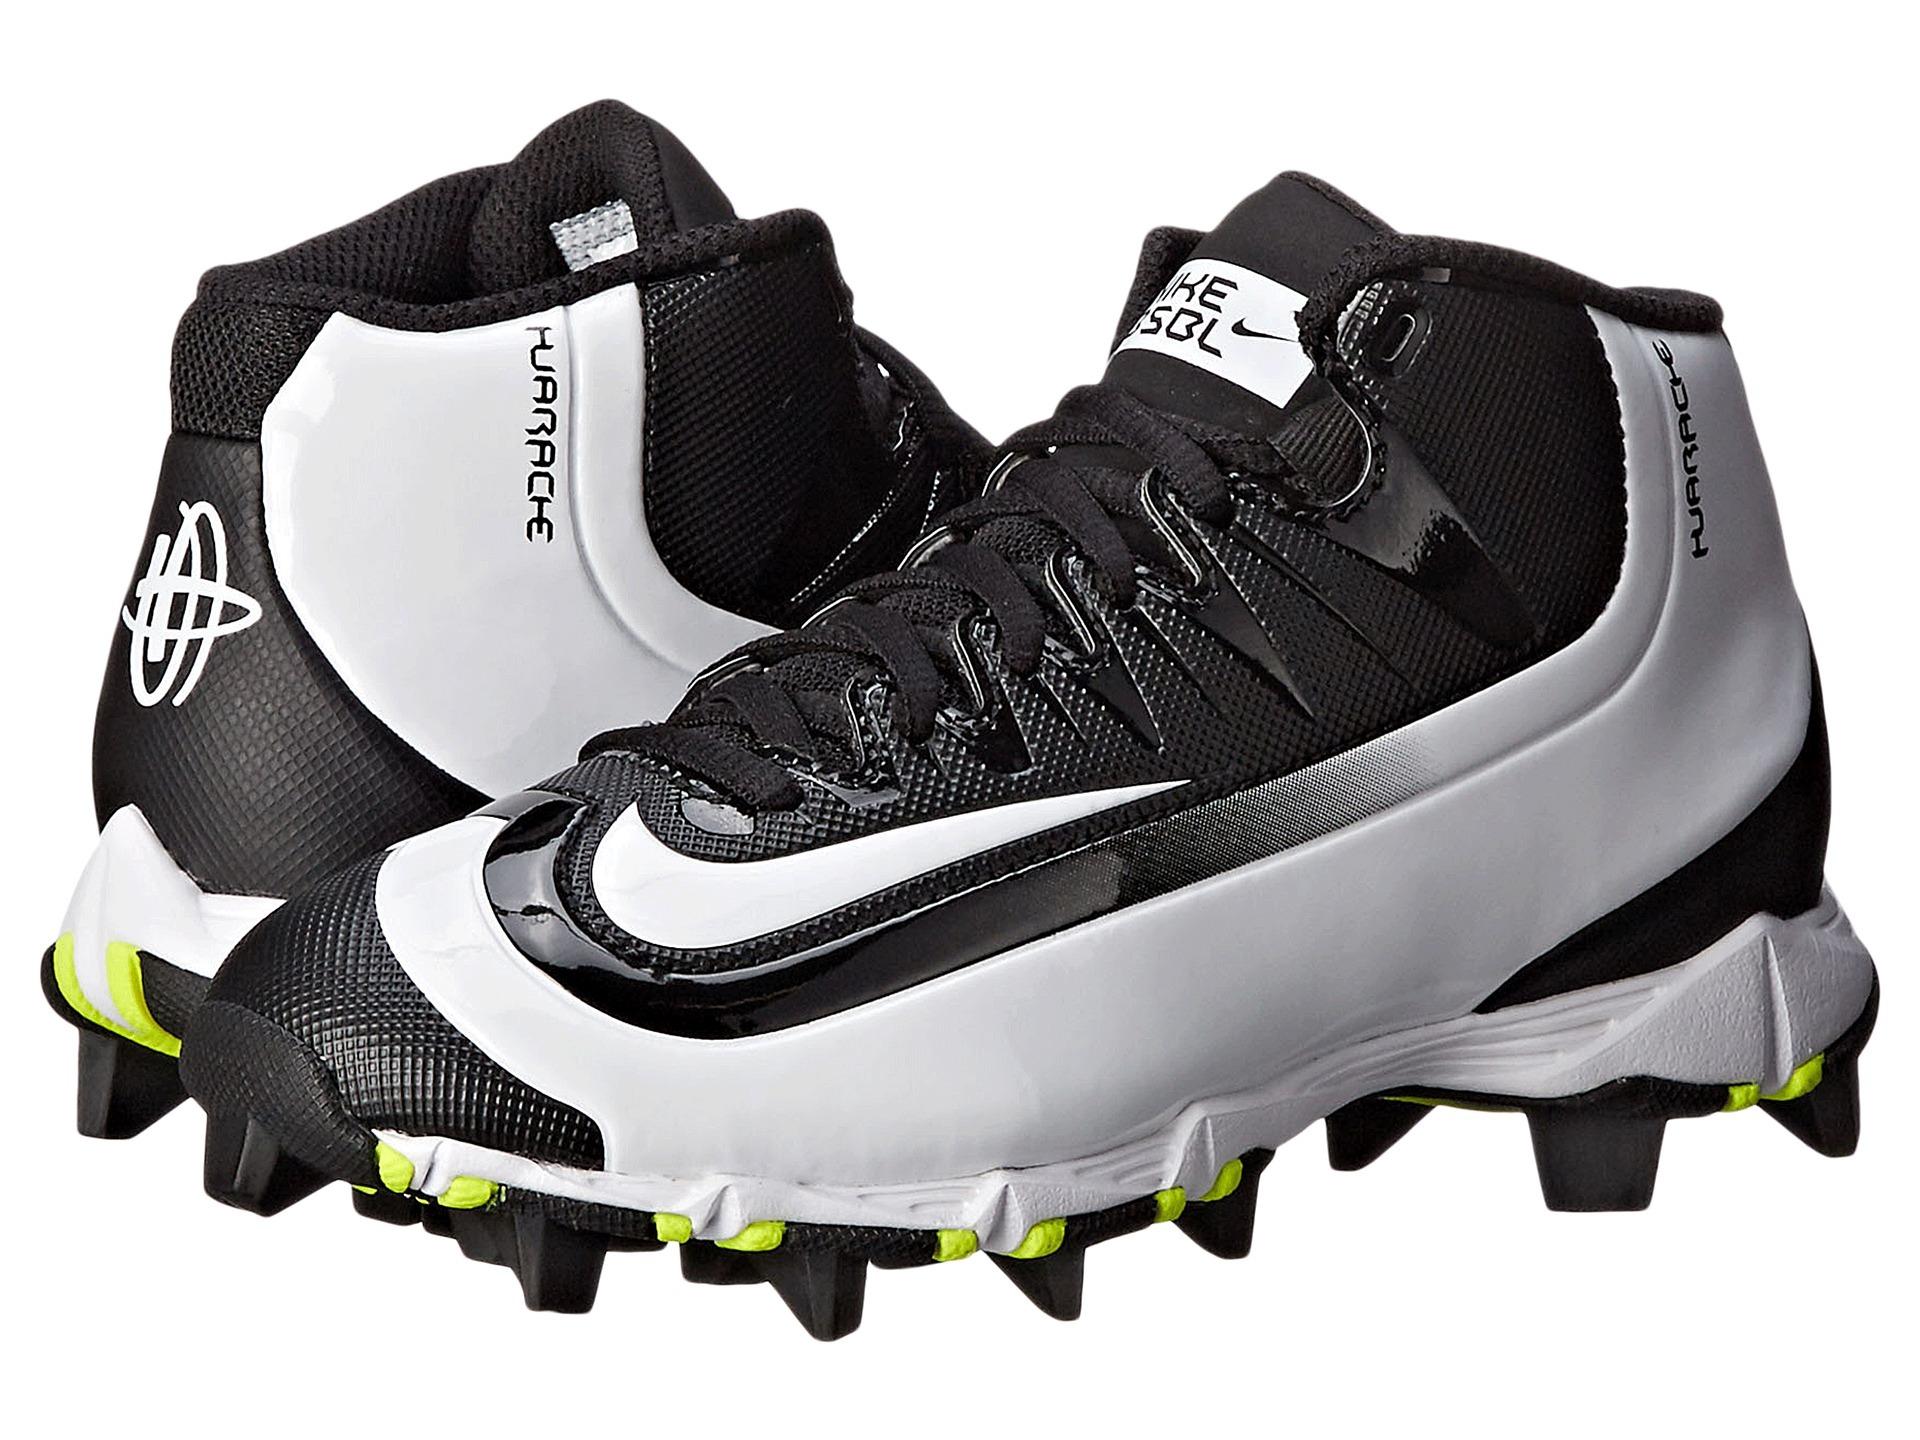 a1ac5ae17f79 Nike Huarache 2KFilth Keystone Mid (807141) - Forelle American Sports  Equipment